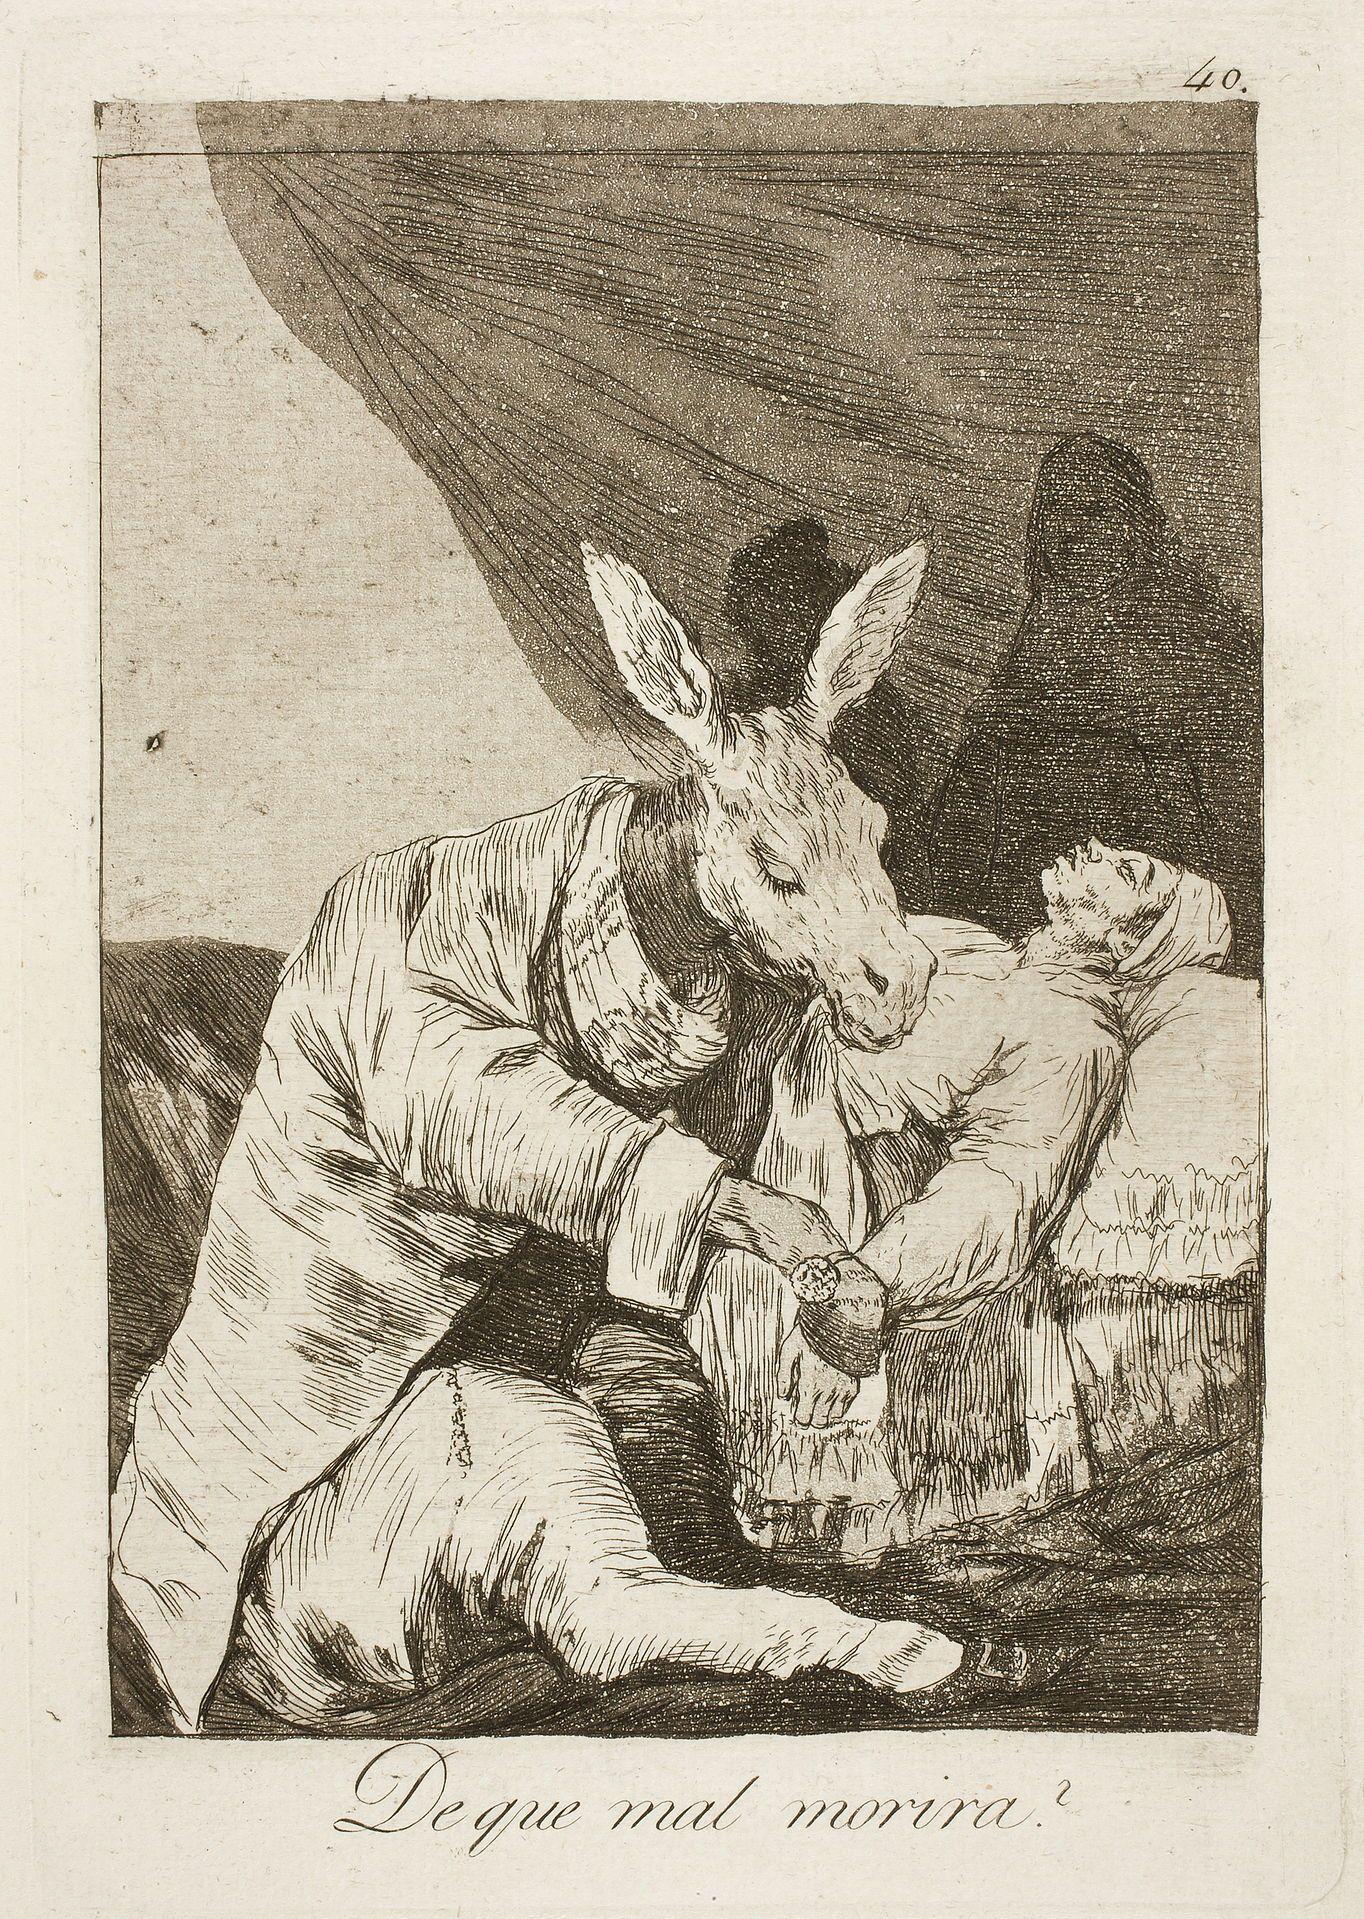 Los caprichos - Wikipedia | Francisco goya, Art painting, Art